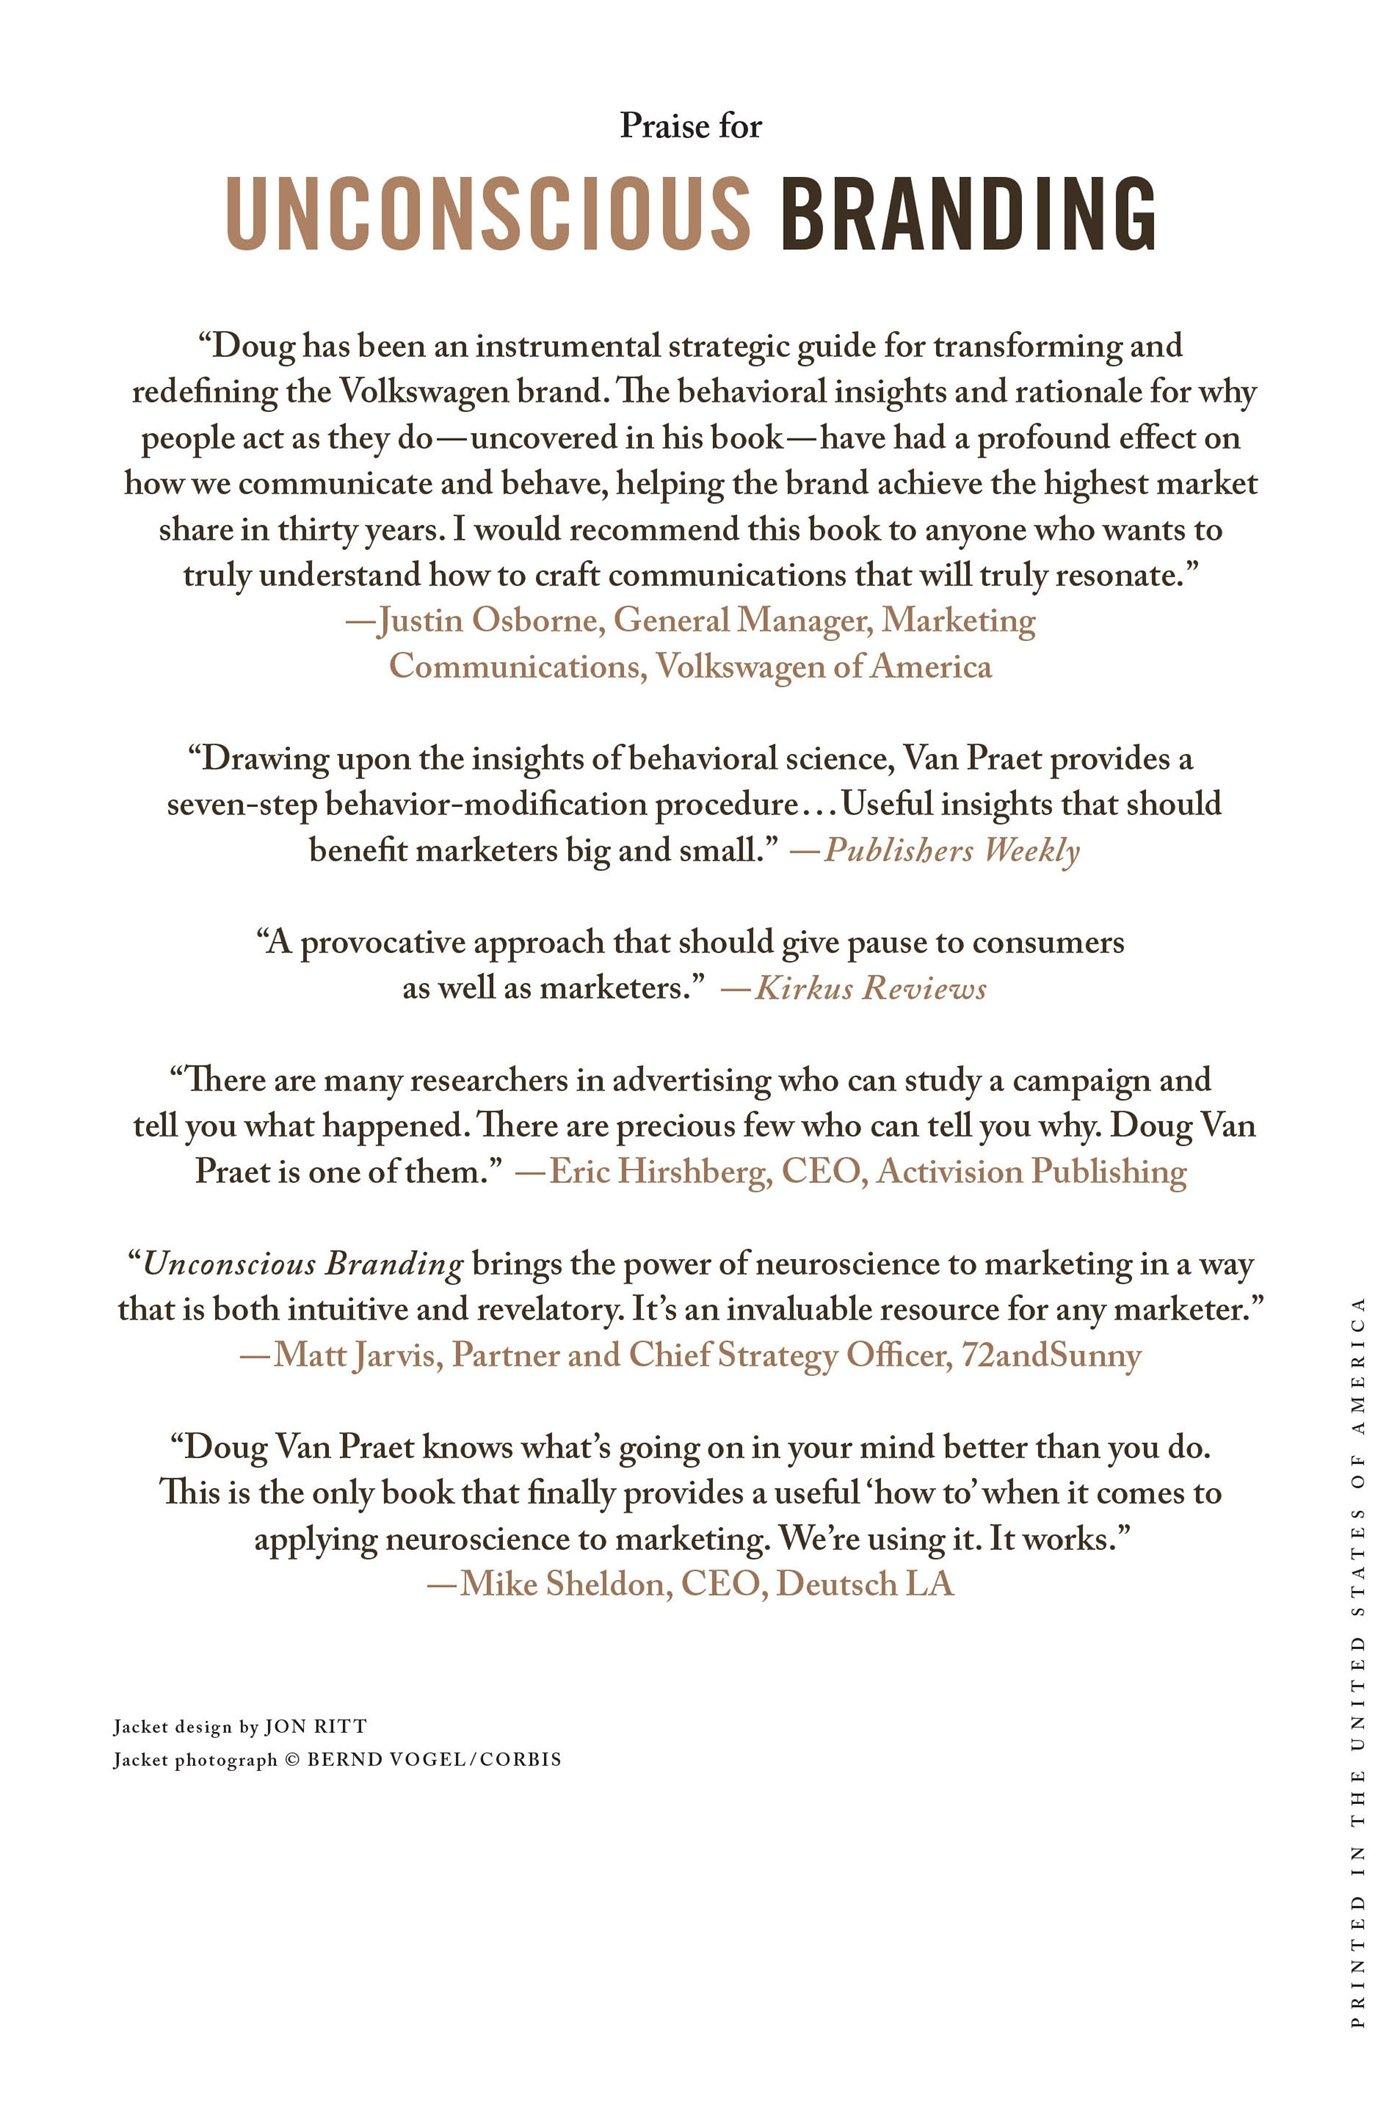 Unconscious Branding: How Neuroscience Can Empower (and Inspire) Marketing:  Amazon: Douglas Van Praet: 9780230341791: Books